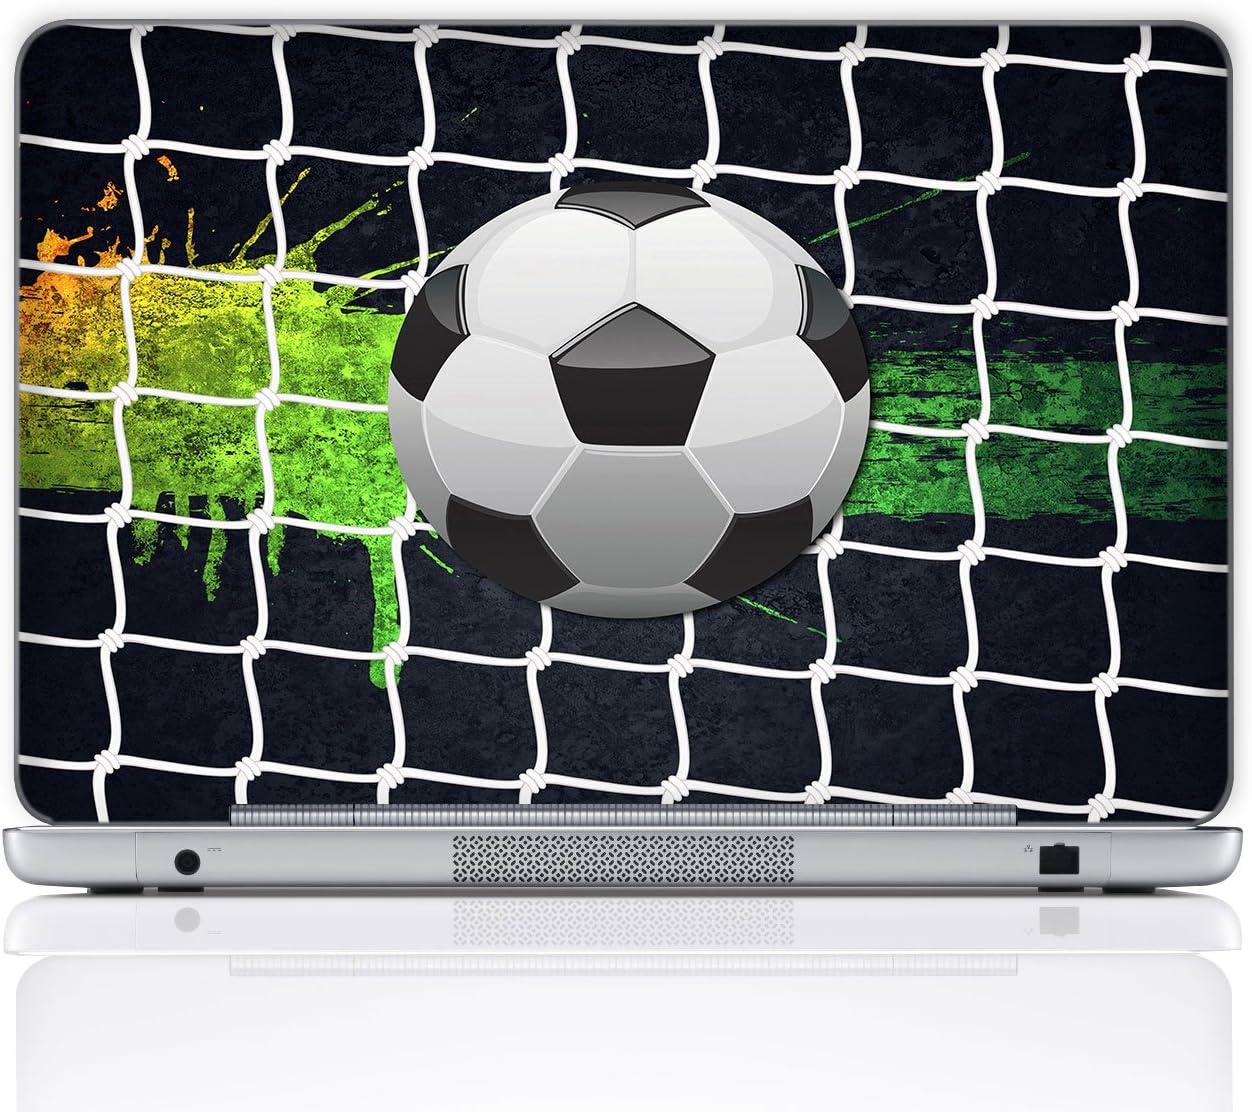 Meffort Inc 15 15.6 Inch Laptop Notebook Skin Sticker Cover Art Decal (Free Wrist pad) - Soccer